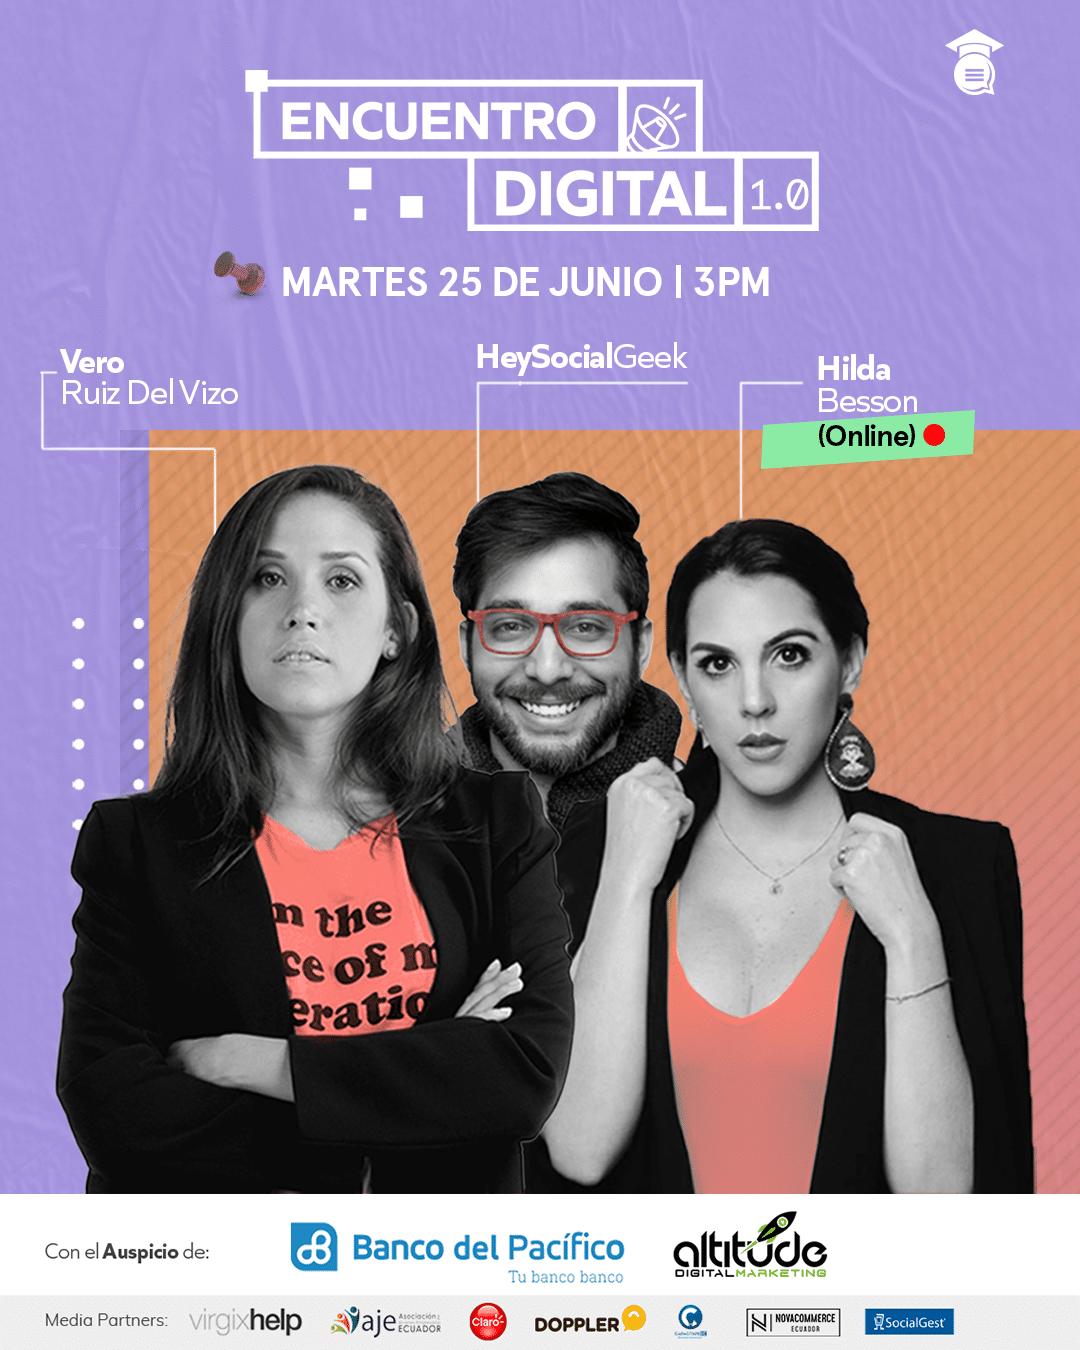 Encuentro Digital 2019 Eventos Guayaquil Ecuador